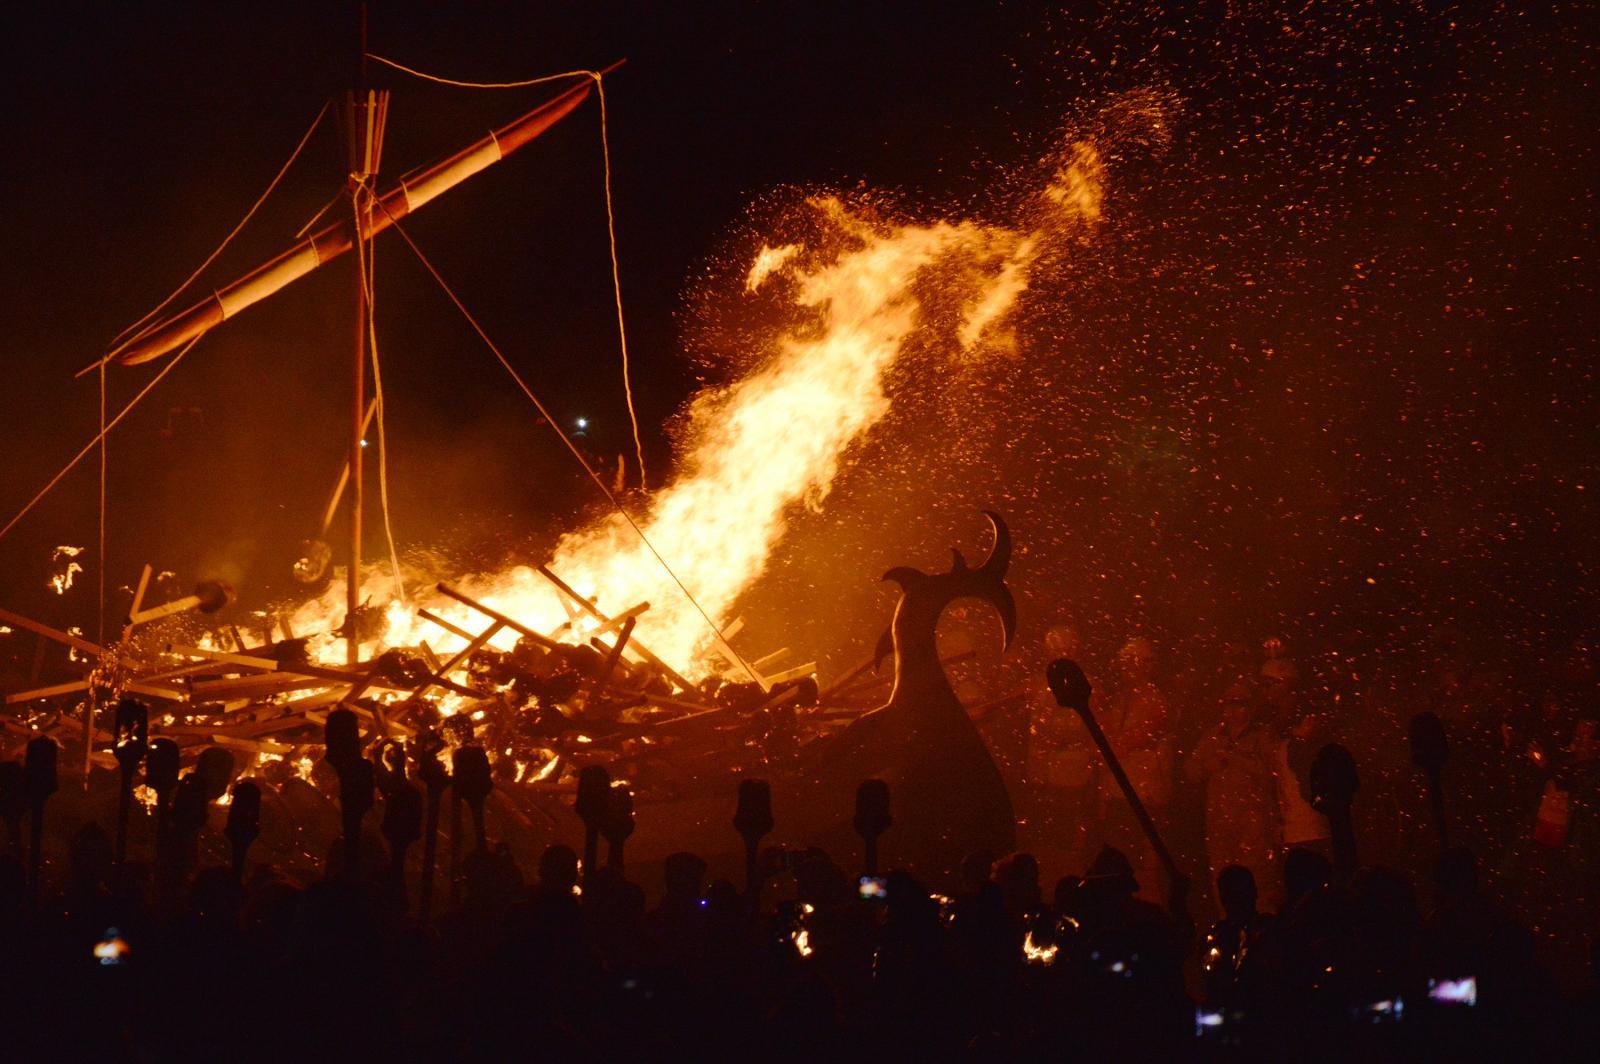 Shetland - Up Helly Aa the Viking celebration, Weather Radar and Jimmy Perez